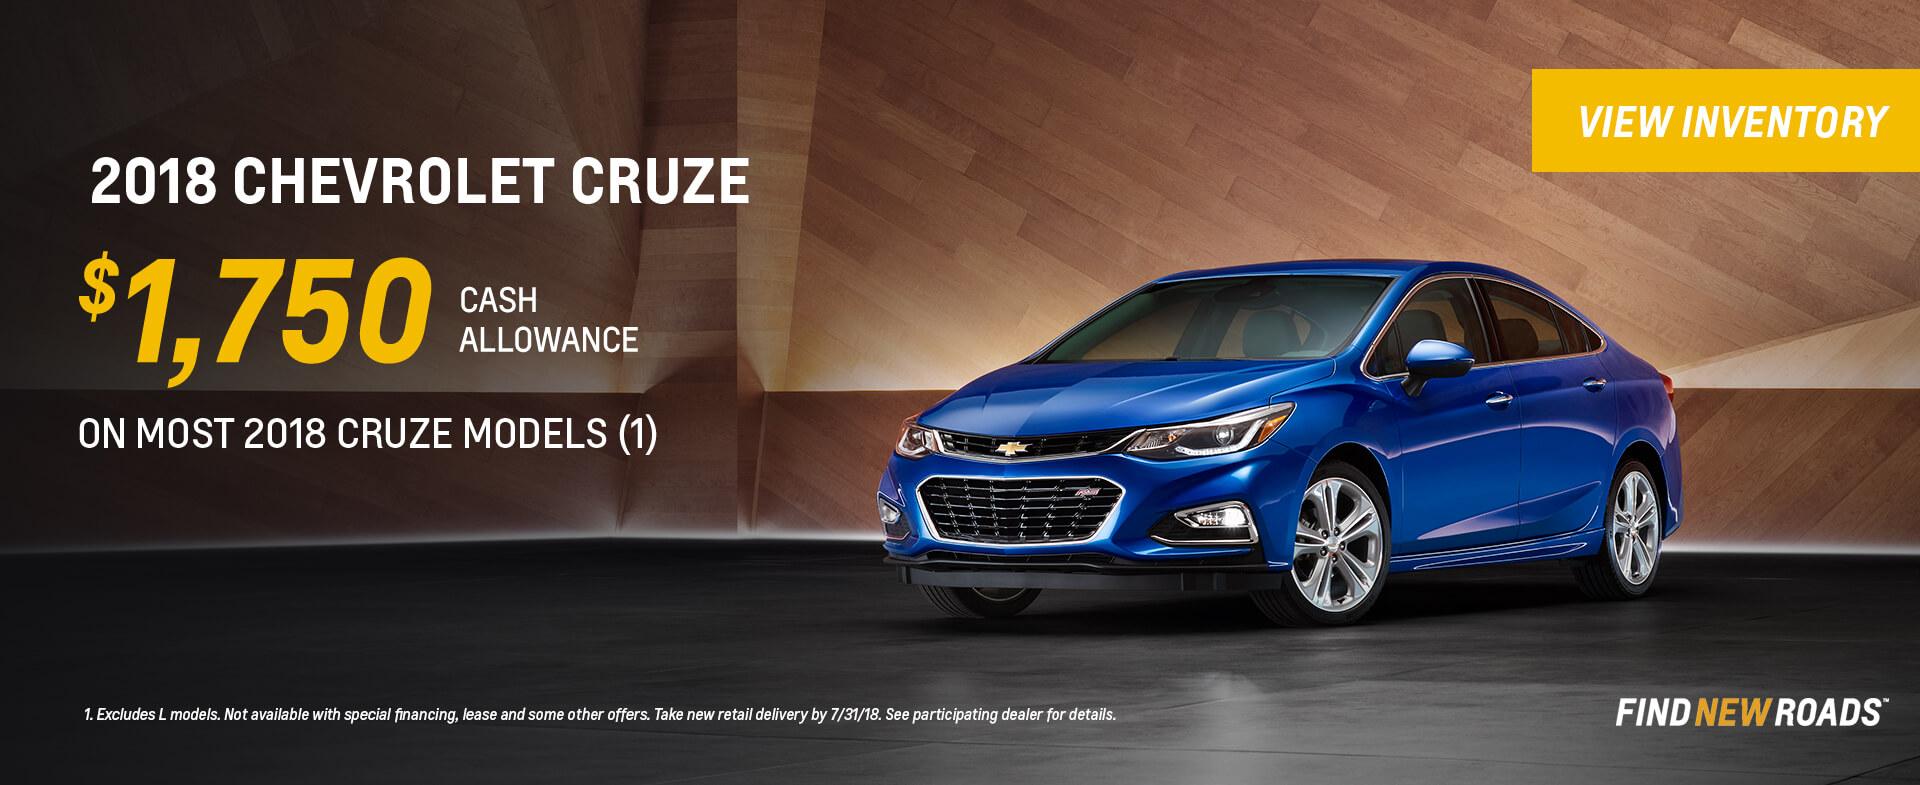 2018 Chevrolet Cruze OEM